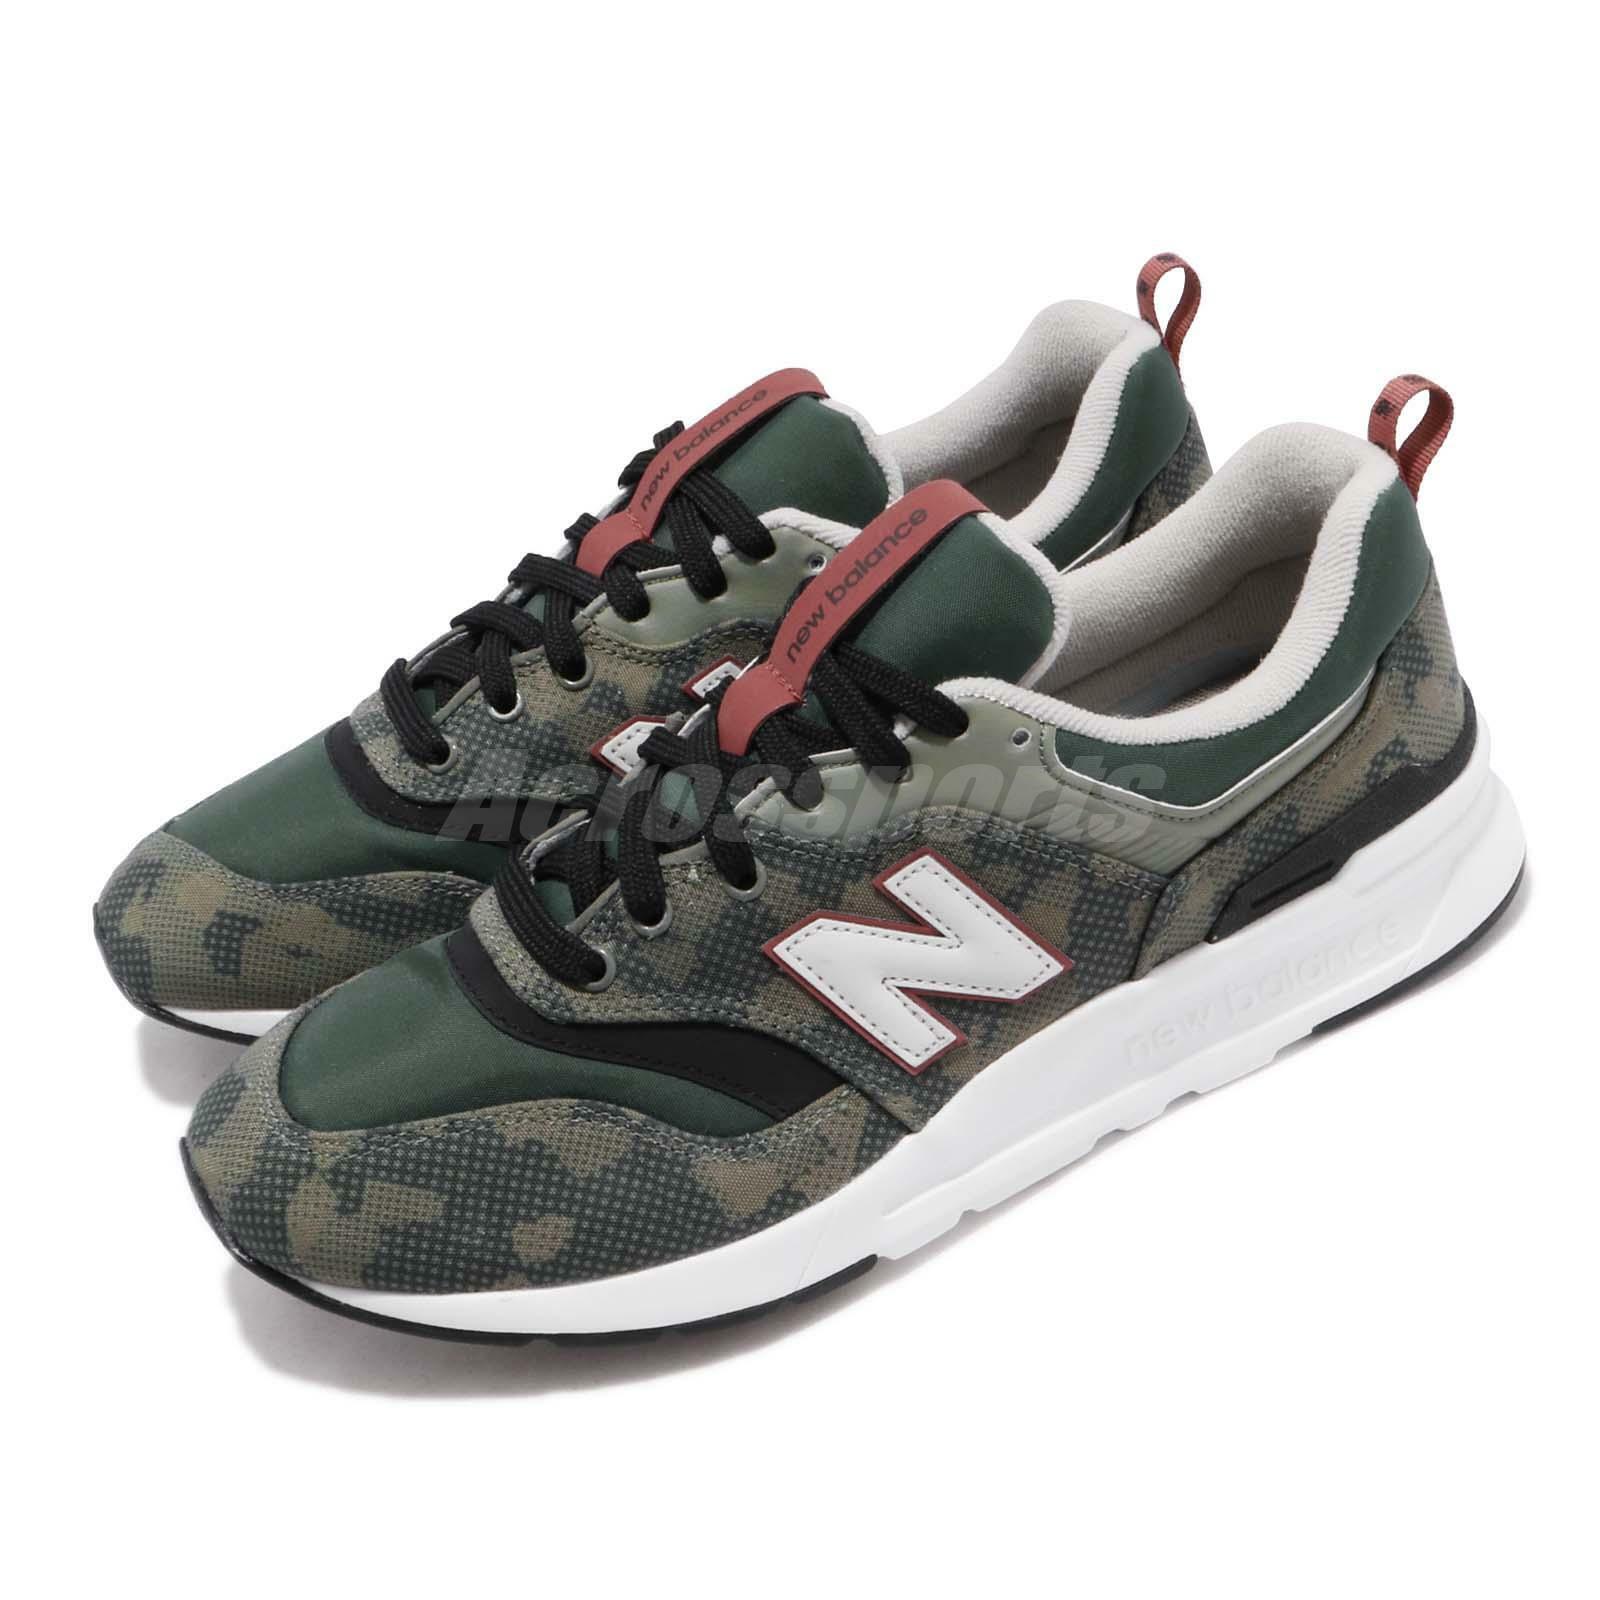 CM997HBG D verde Negro New Balance blanco Men Running Zapatos TENIS CM 997 hbgd